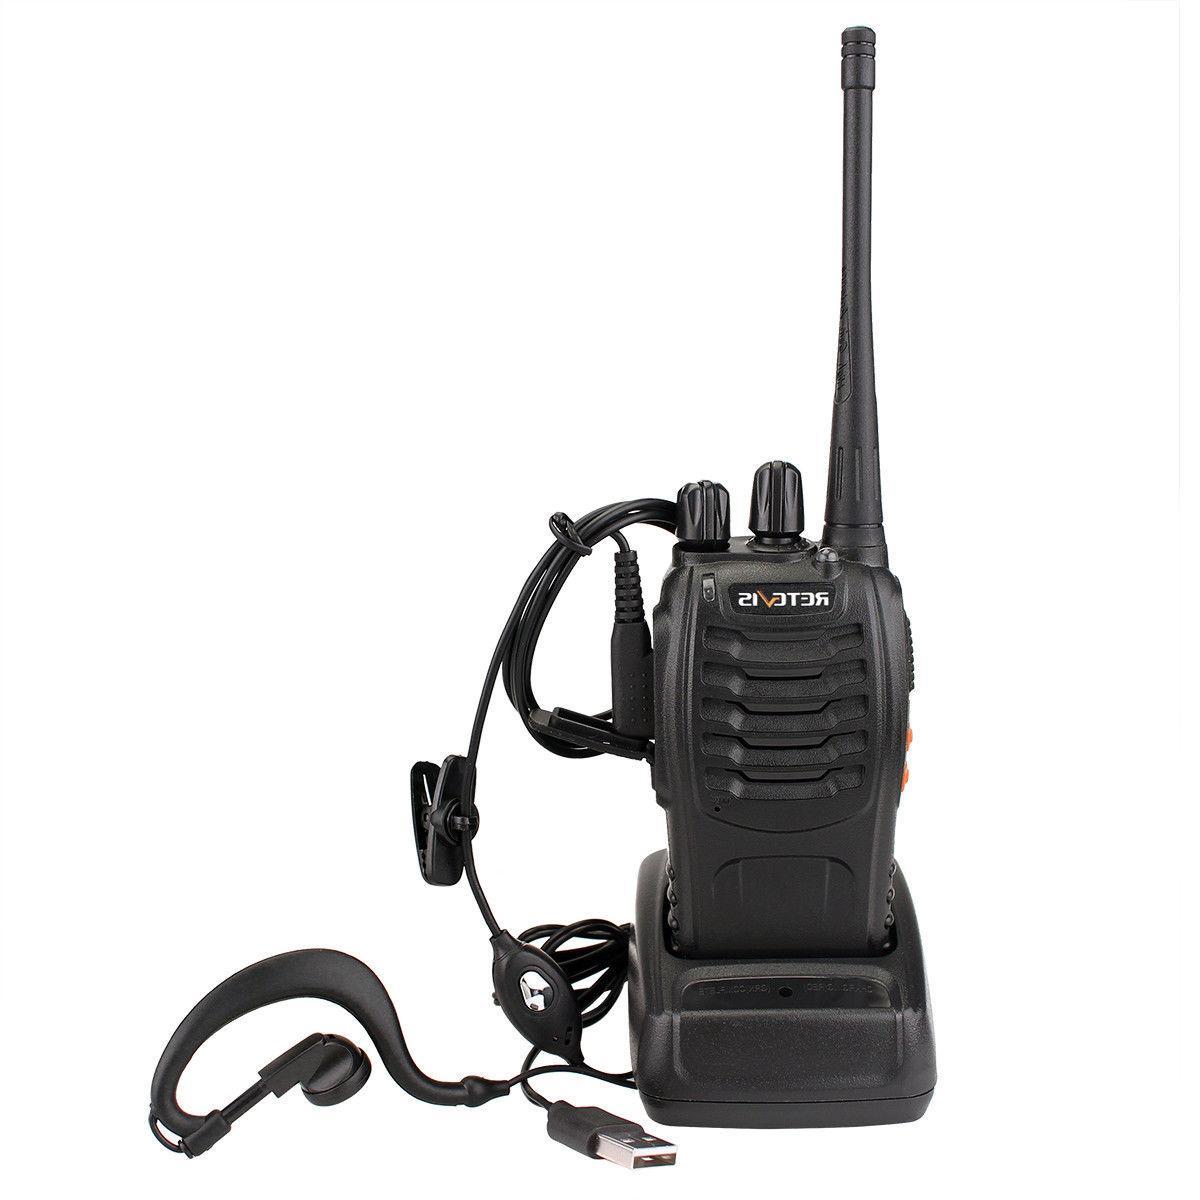 20XRetevis H-777 Walkie Talkies UHF400-470MHz 16CH 5W  2-Way Radio US long range